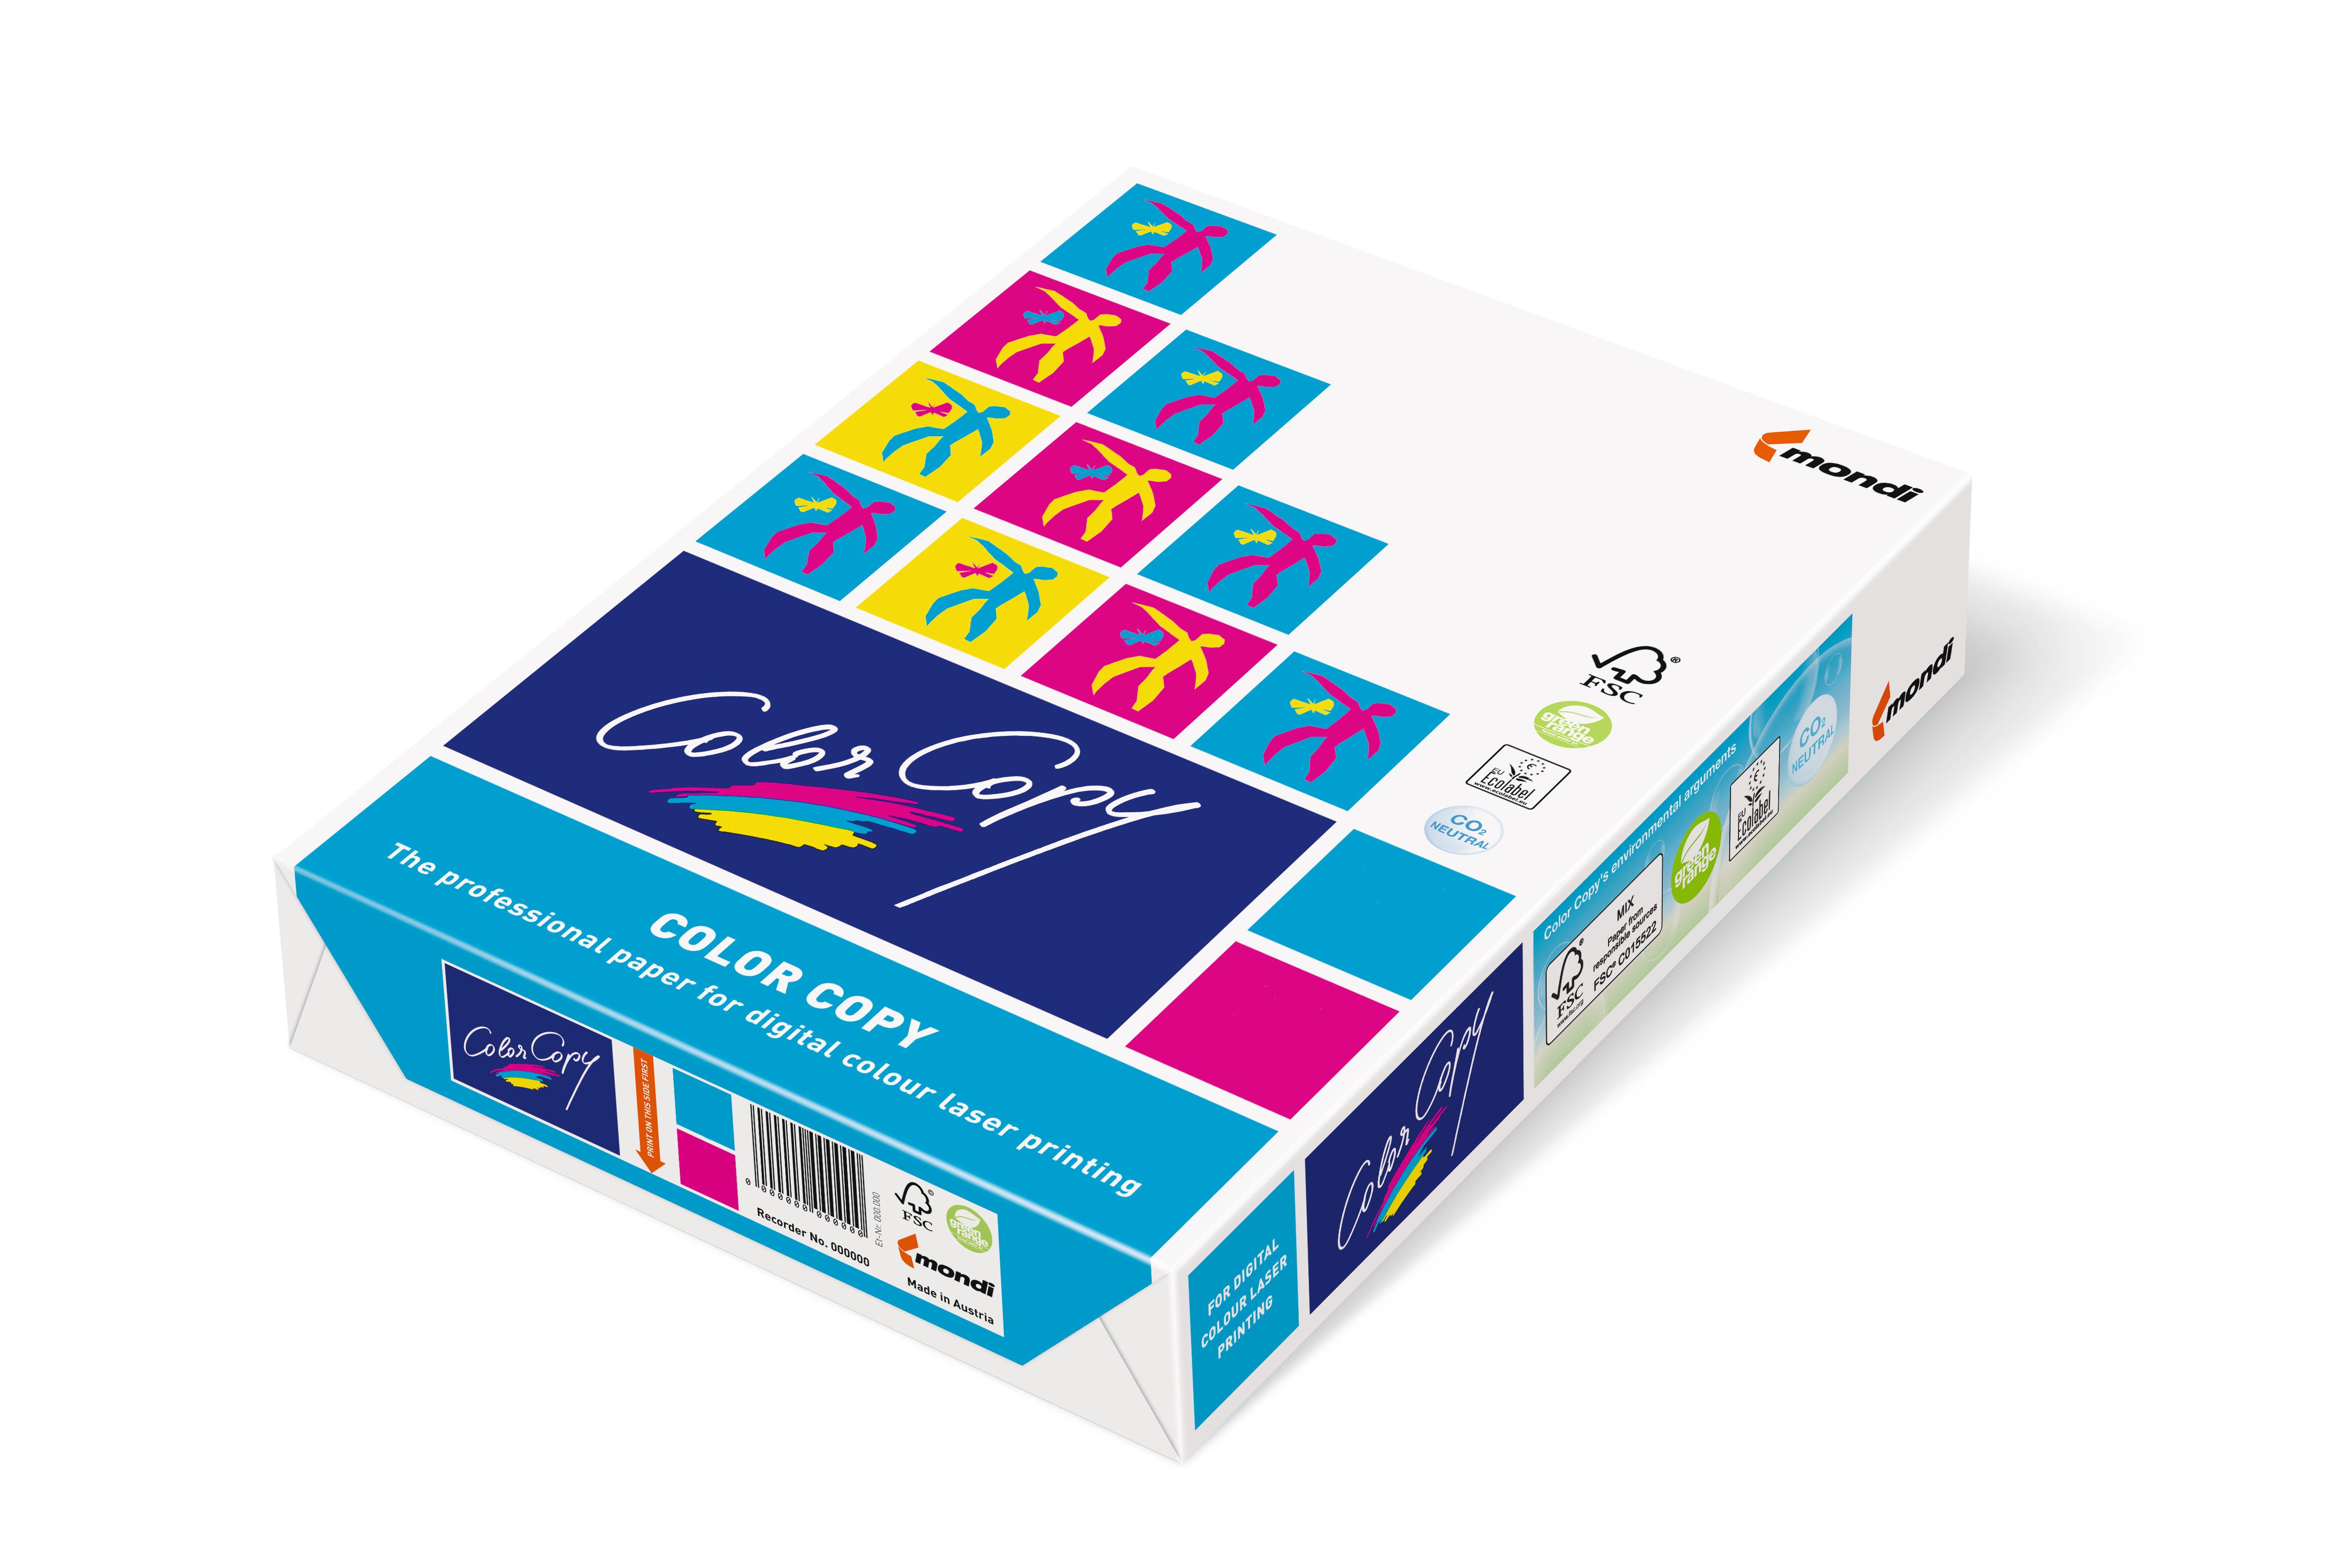 Mondi Color Copy Papier 250g/m² DIN-SRA3 125 Blatt